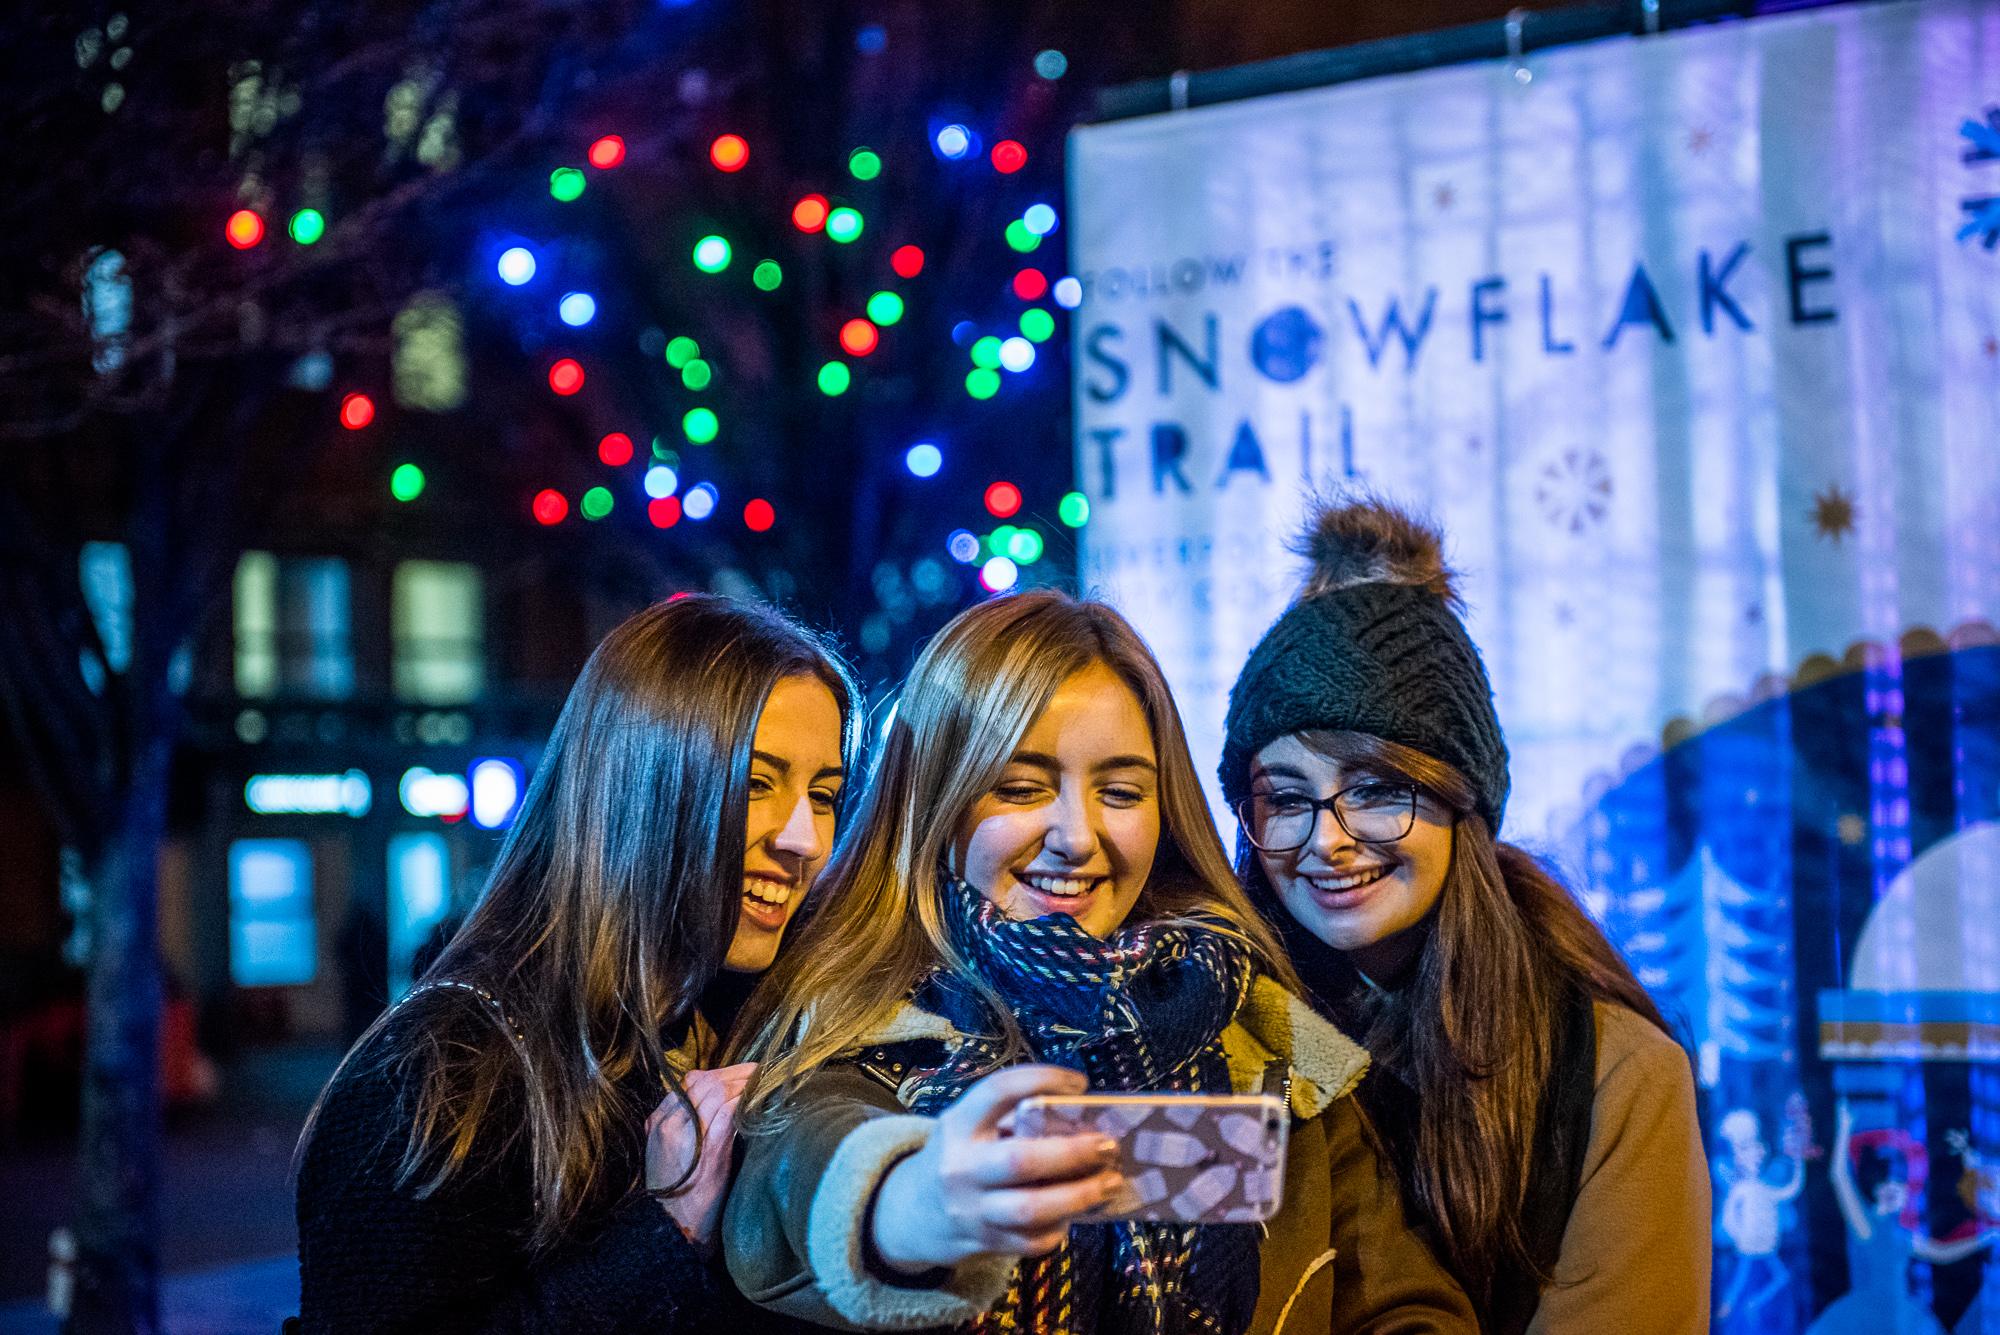 snowflake_trail_liverpool-9.jpg